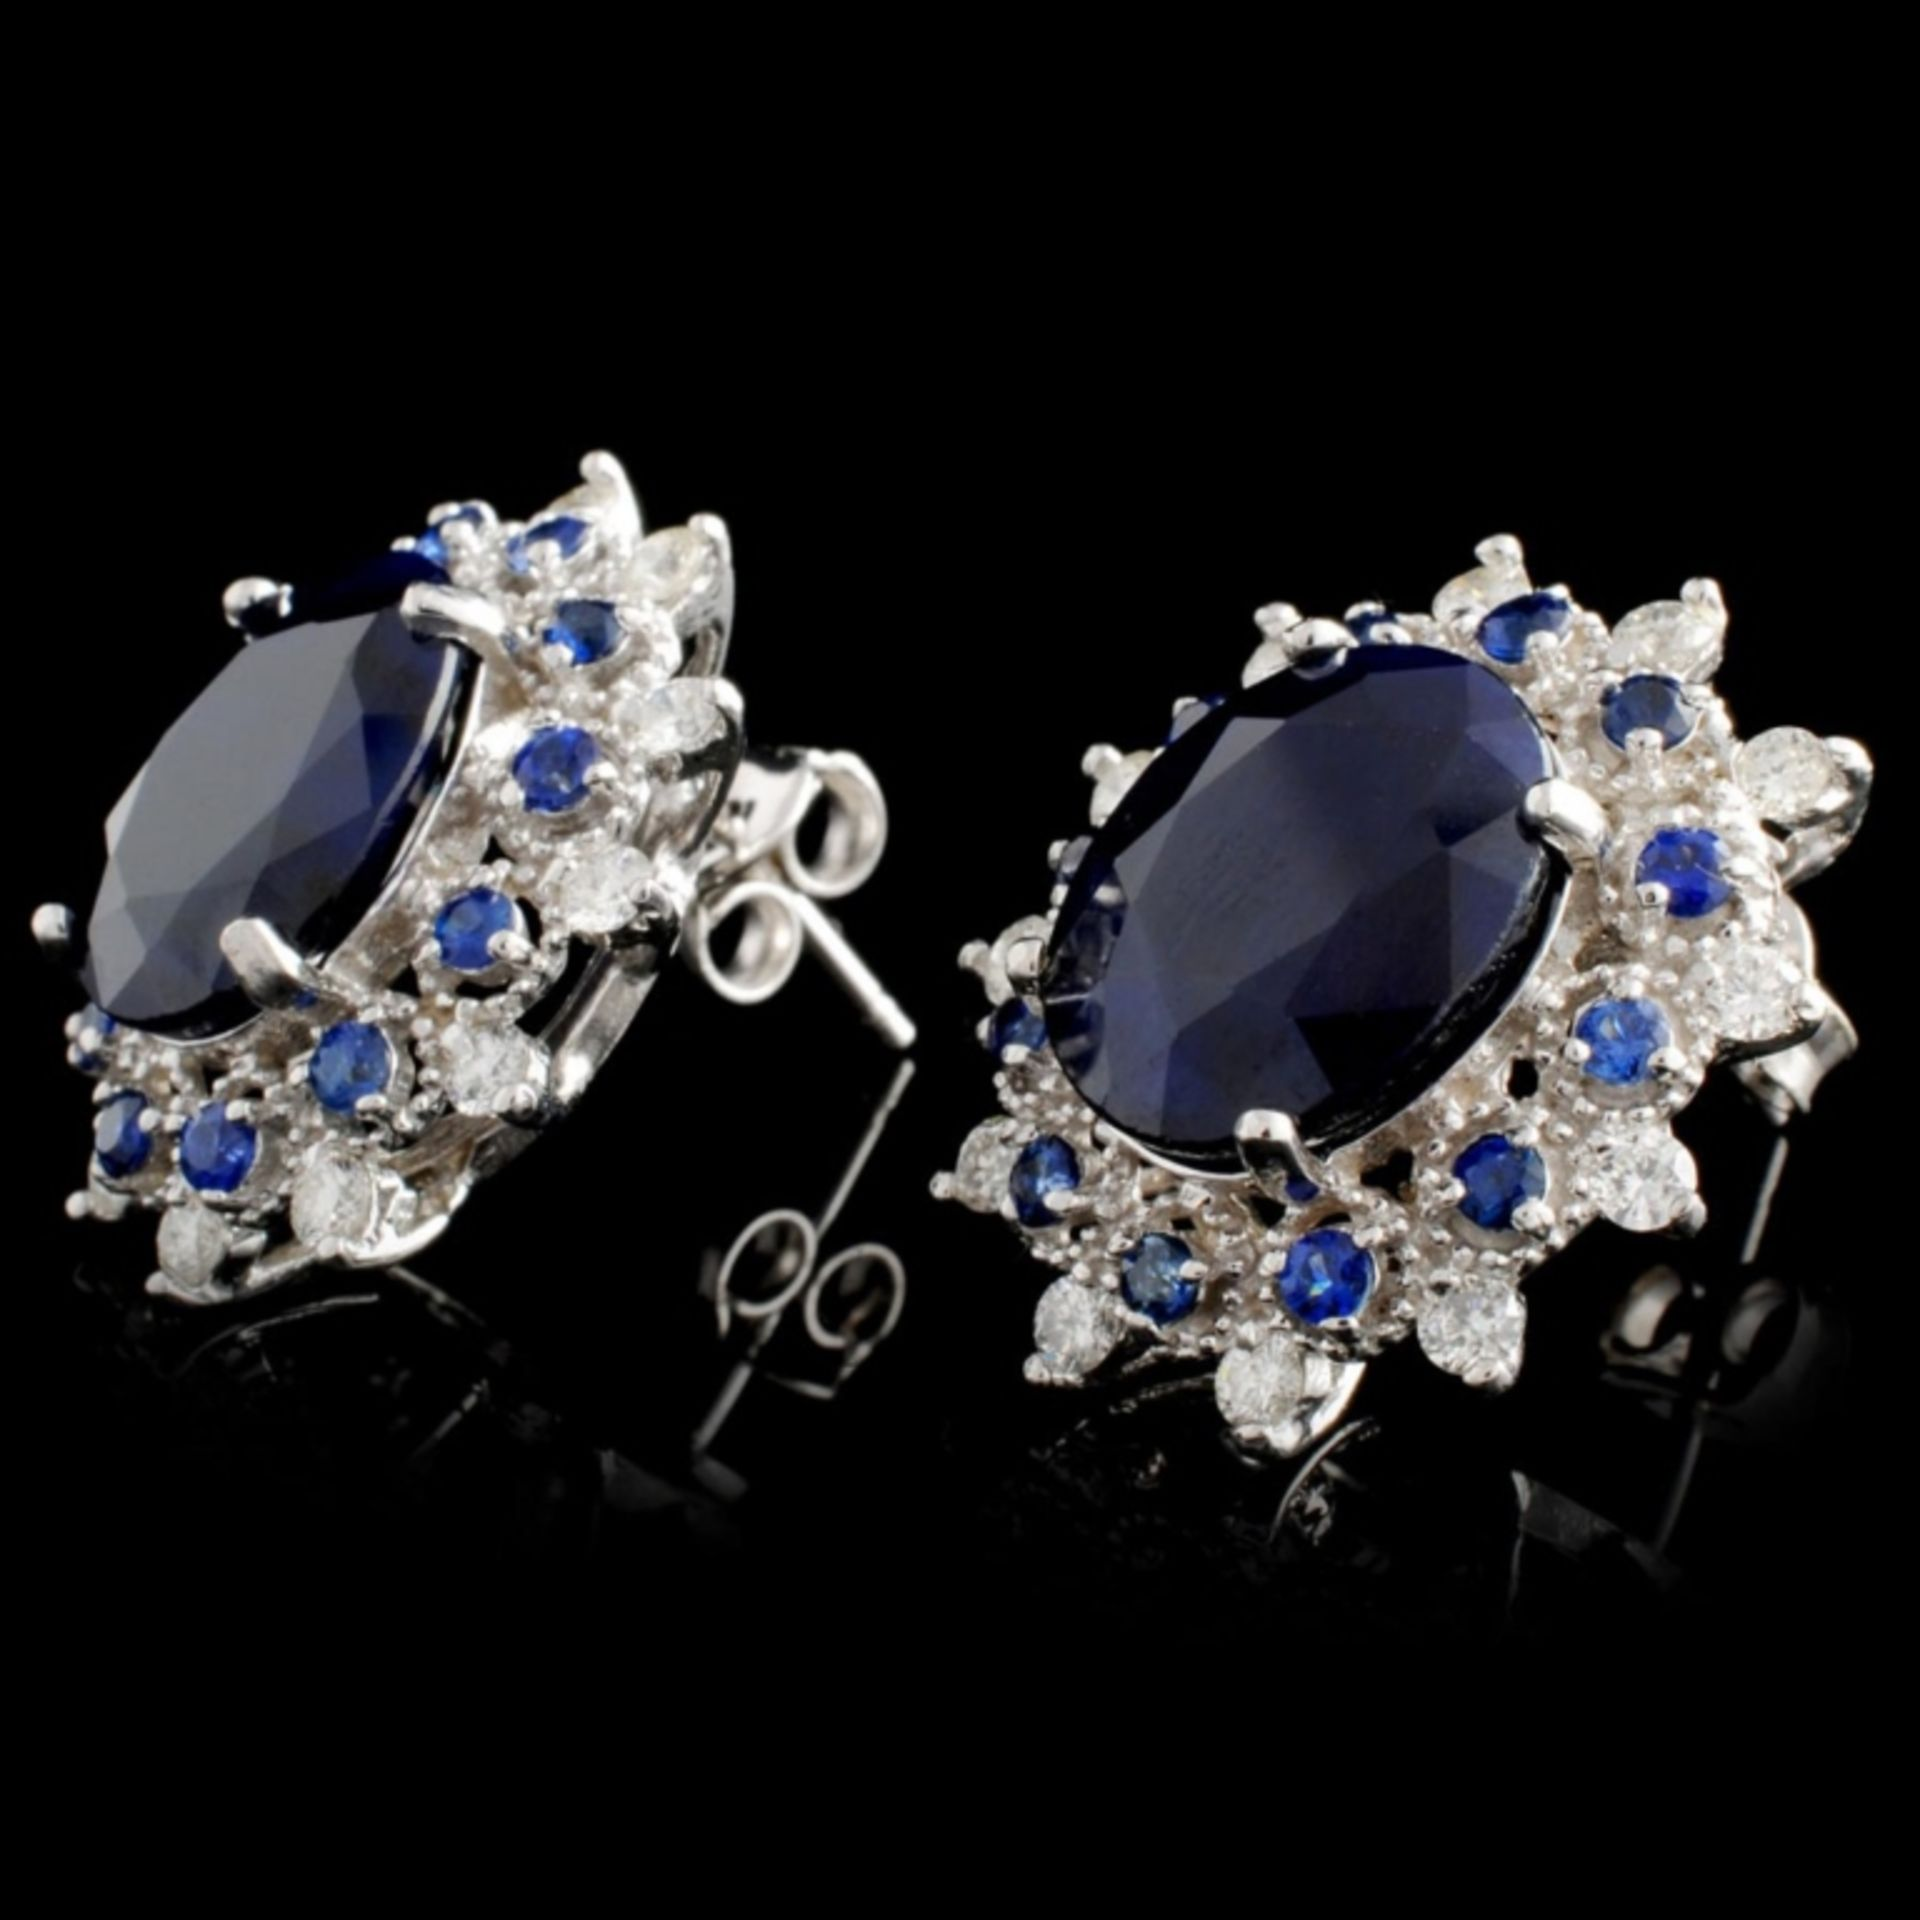 14K Gold 8.00ct Sapphire & 0.50ctw Diamond Earring - Image 2 of 3